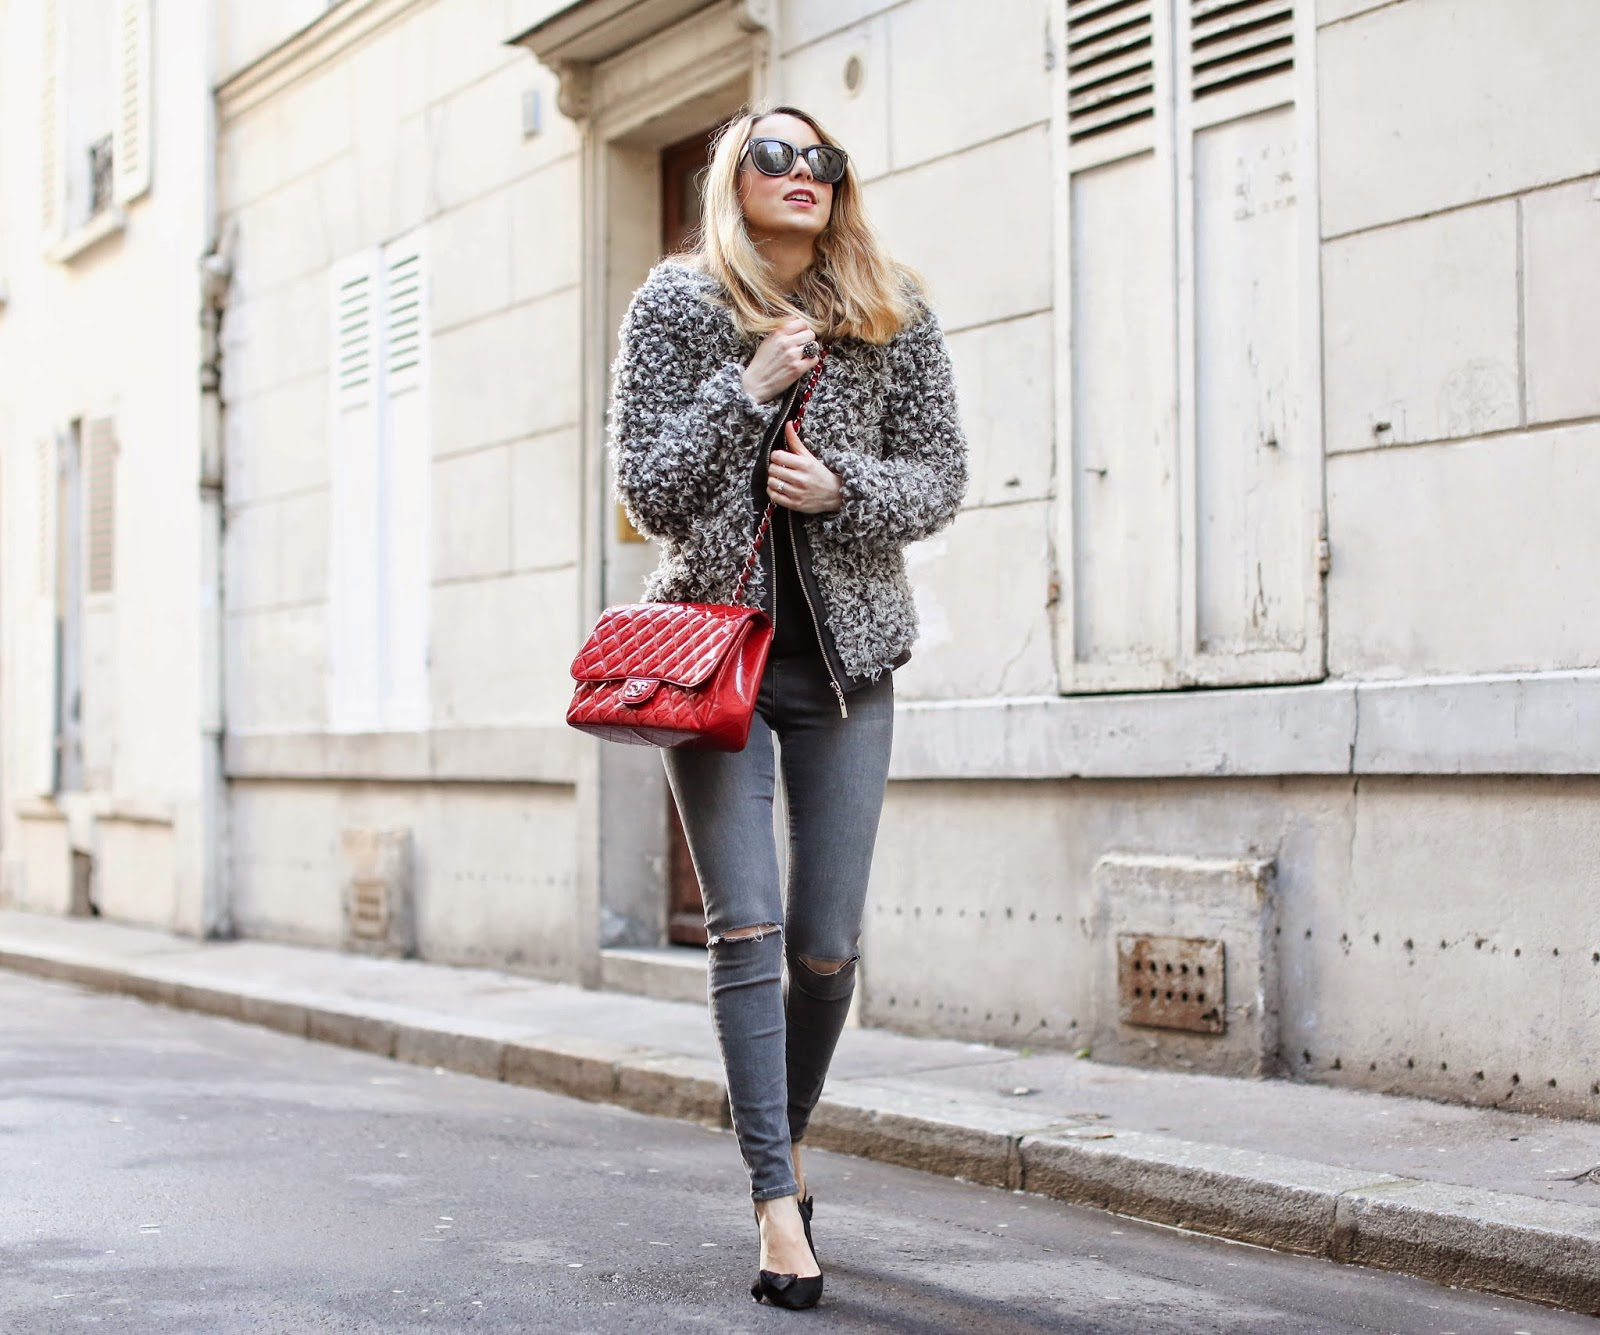 chanel, fluffy jacket, topshop, isabel marant, fashion blogger, streetstyle, céline